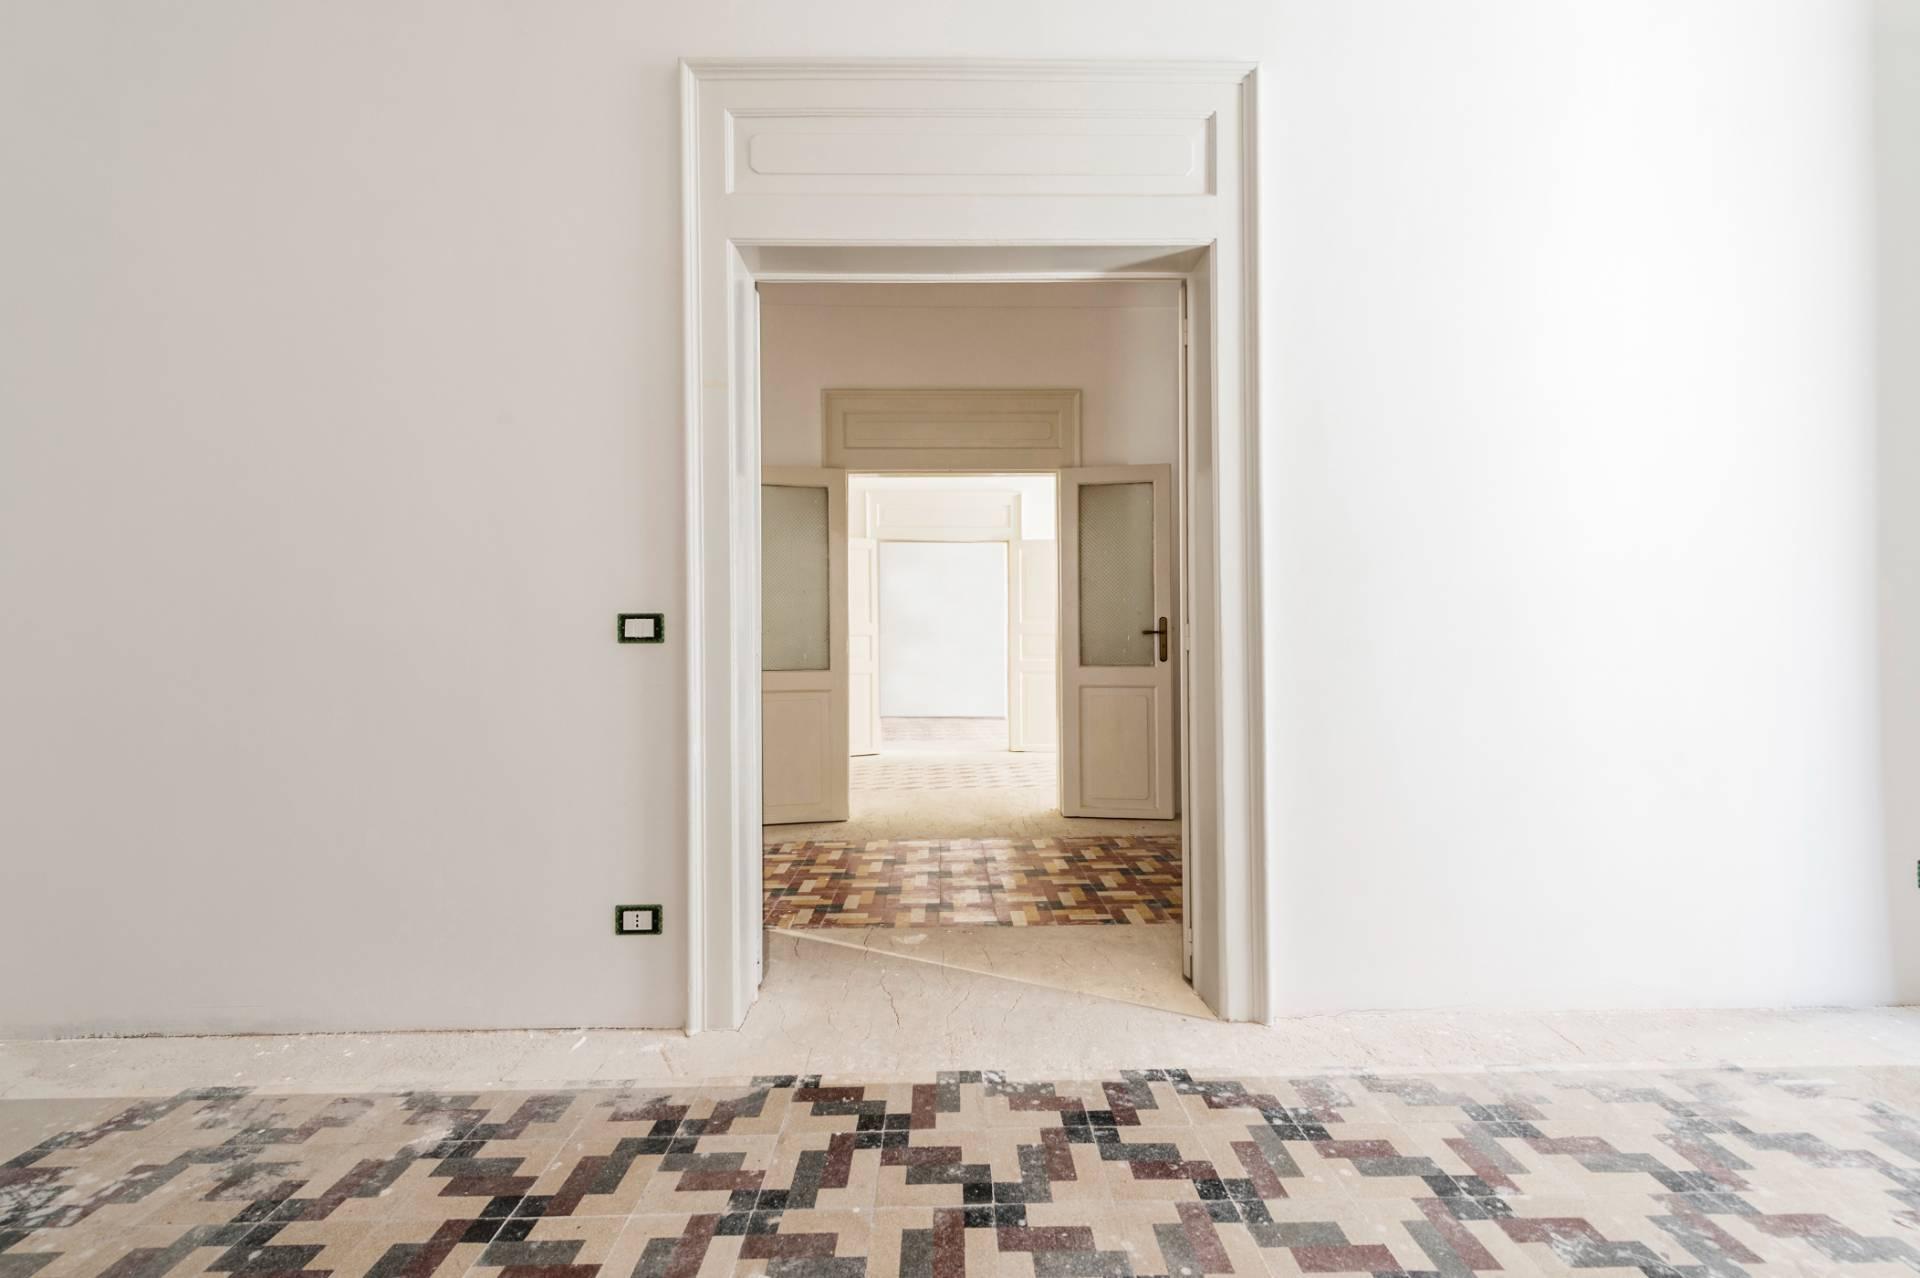 Palazzo in Vendita a Siracusa: 5 locali, 500 mq - Foto 9